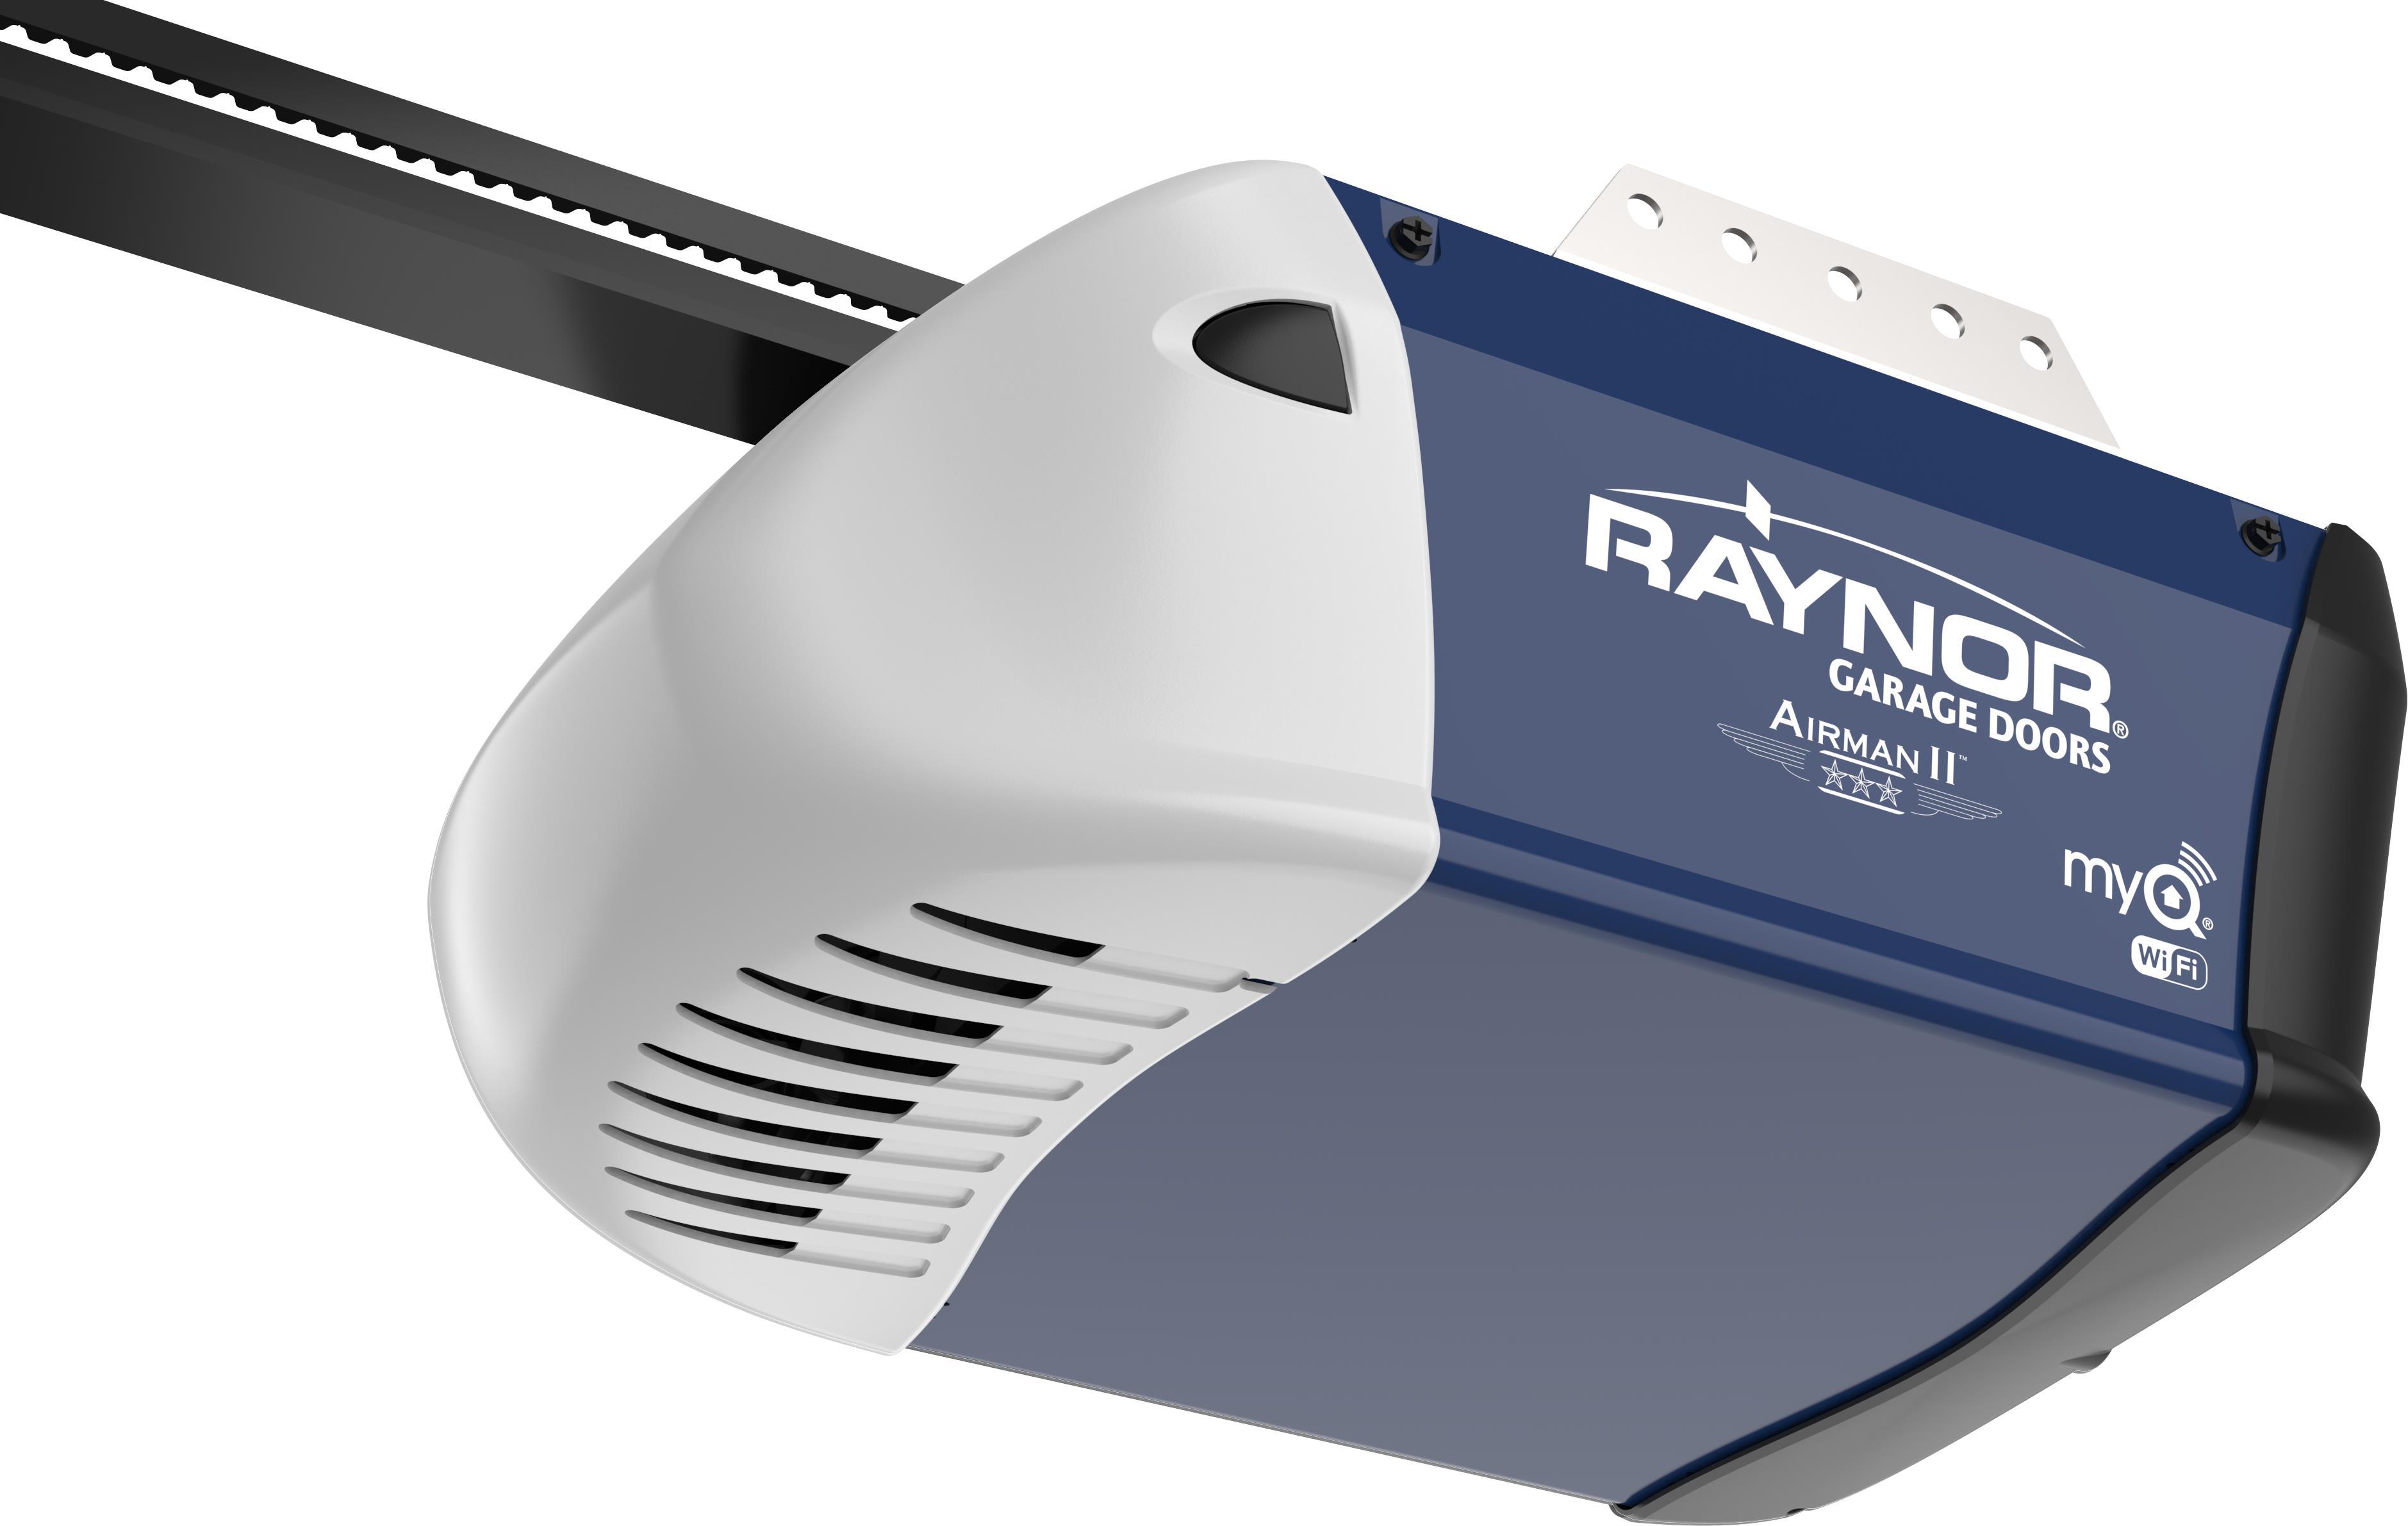 Raynor Garage Door System 2